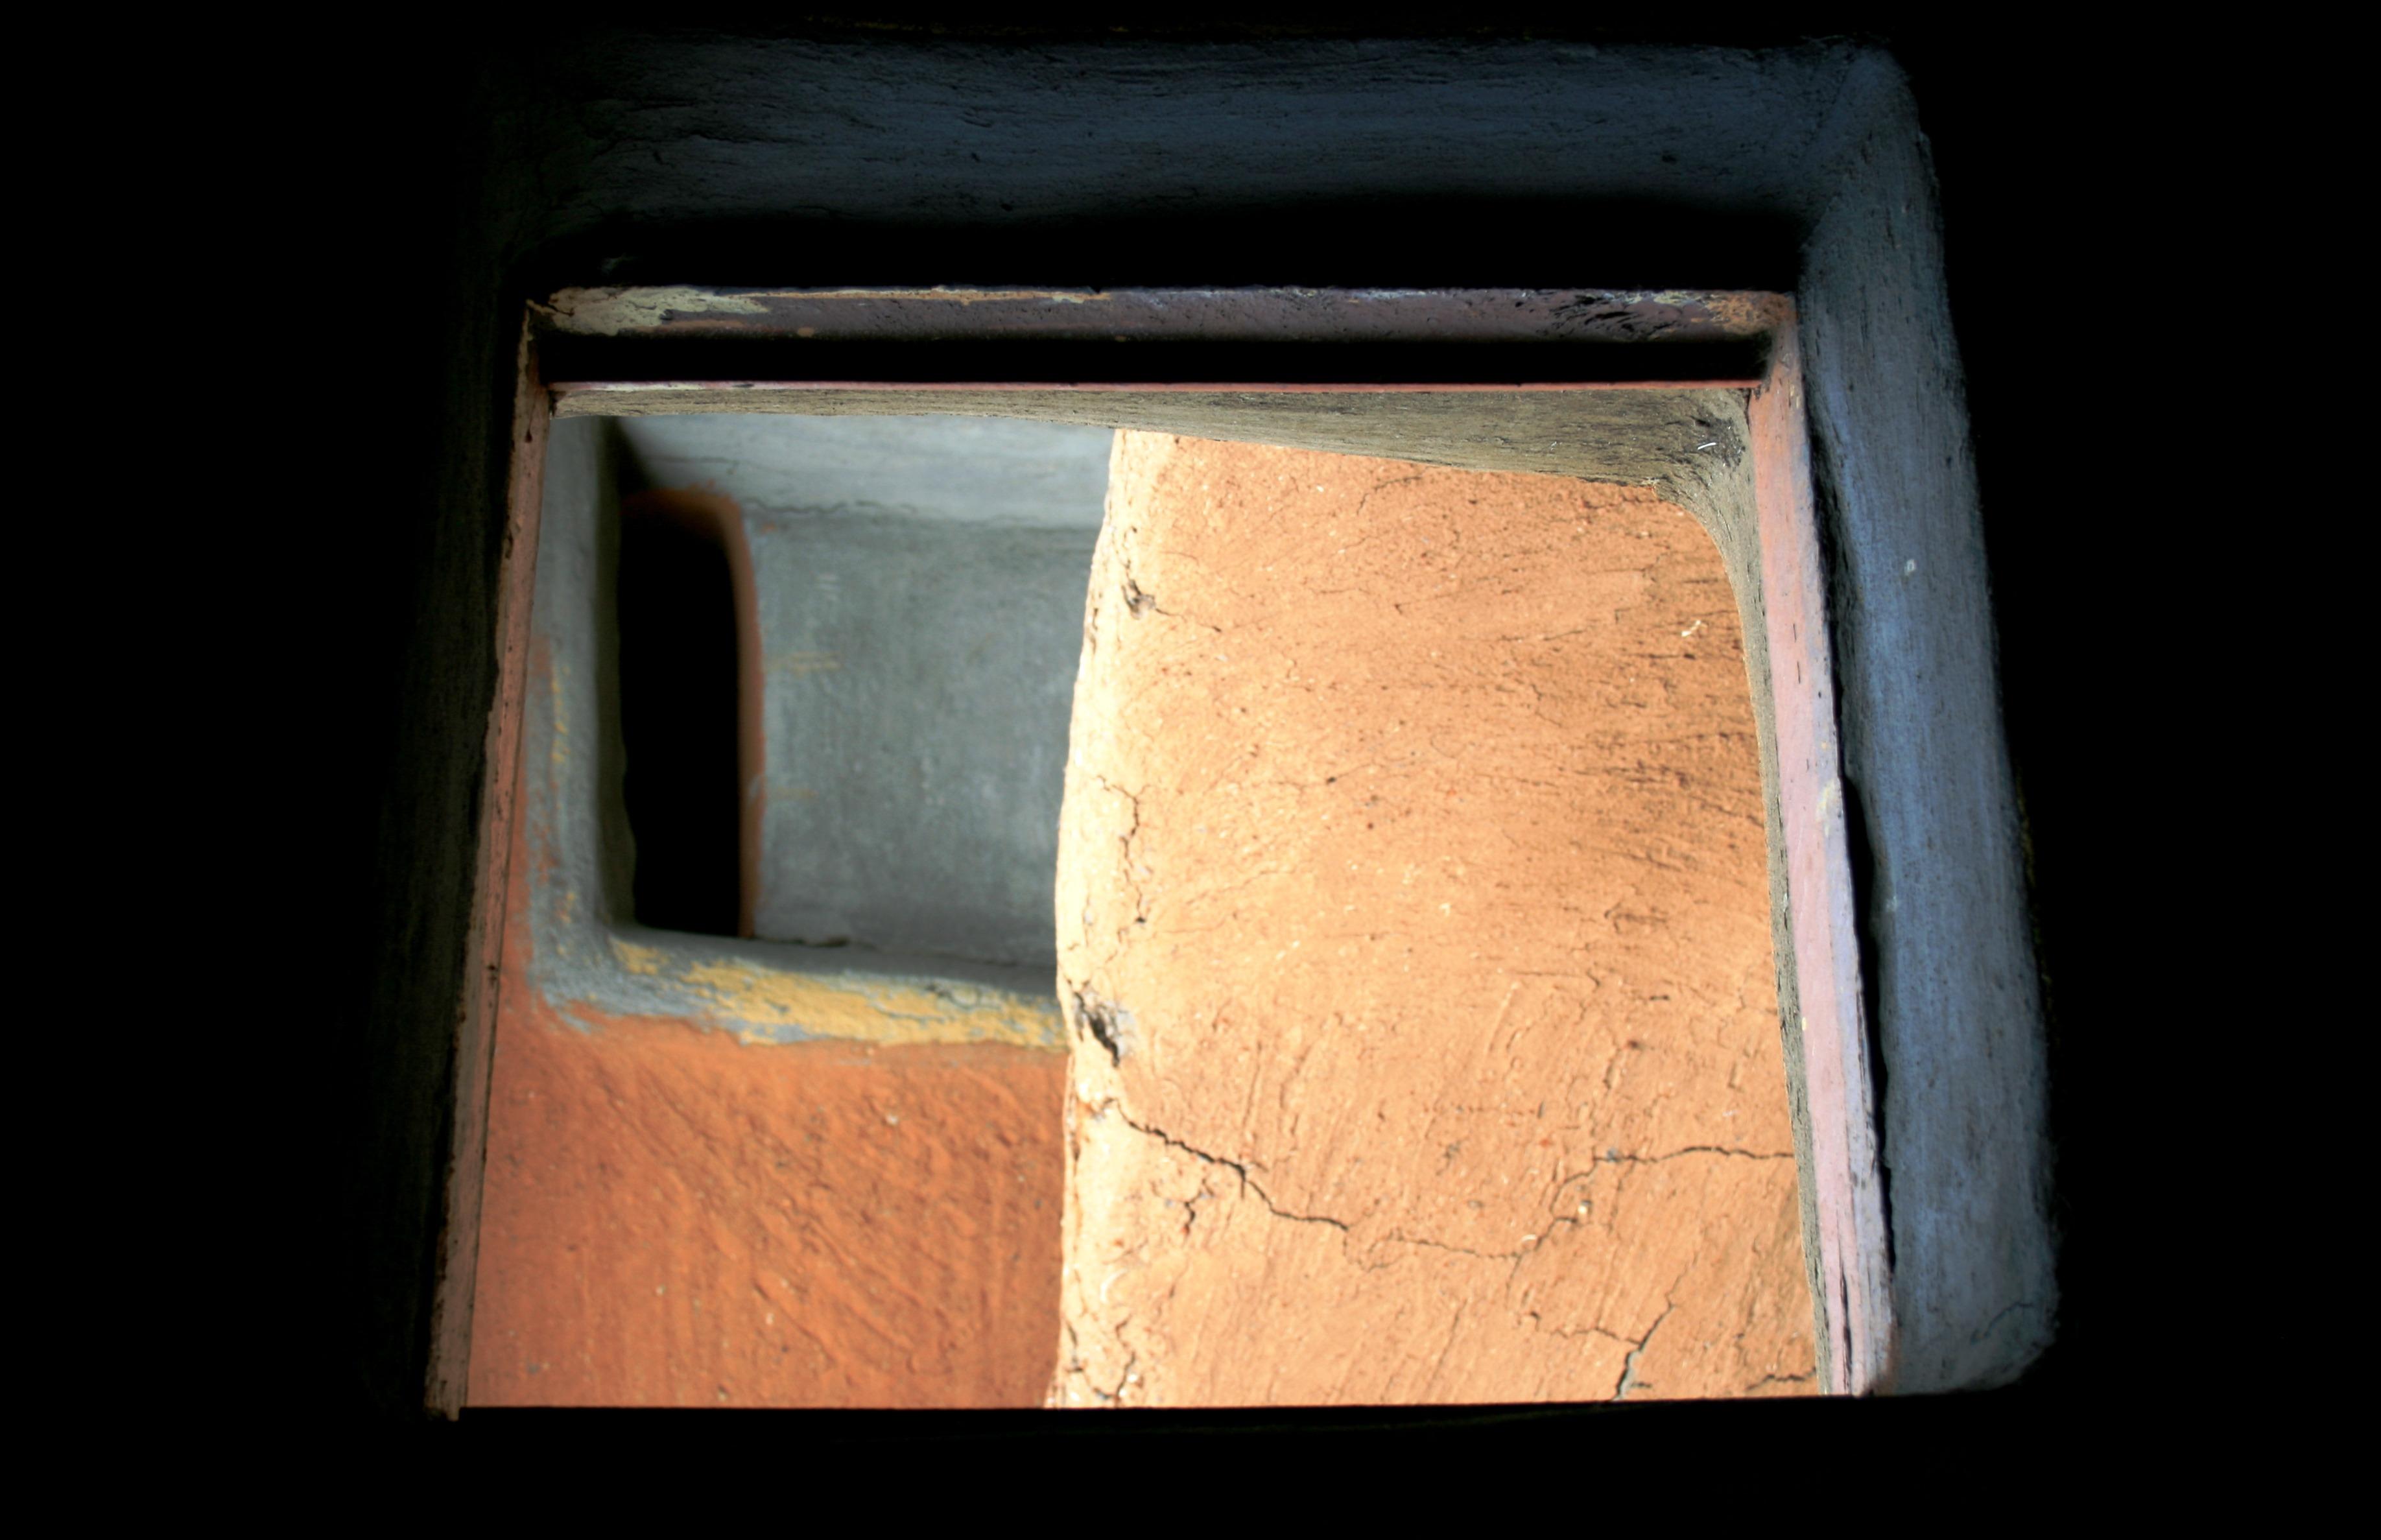 Kostenlose foto : Holz, Farbe, Tür, Material, Terrakotta, grau, Auge ...